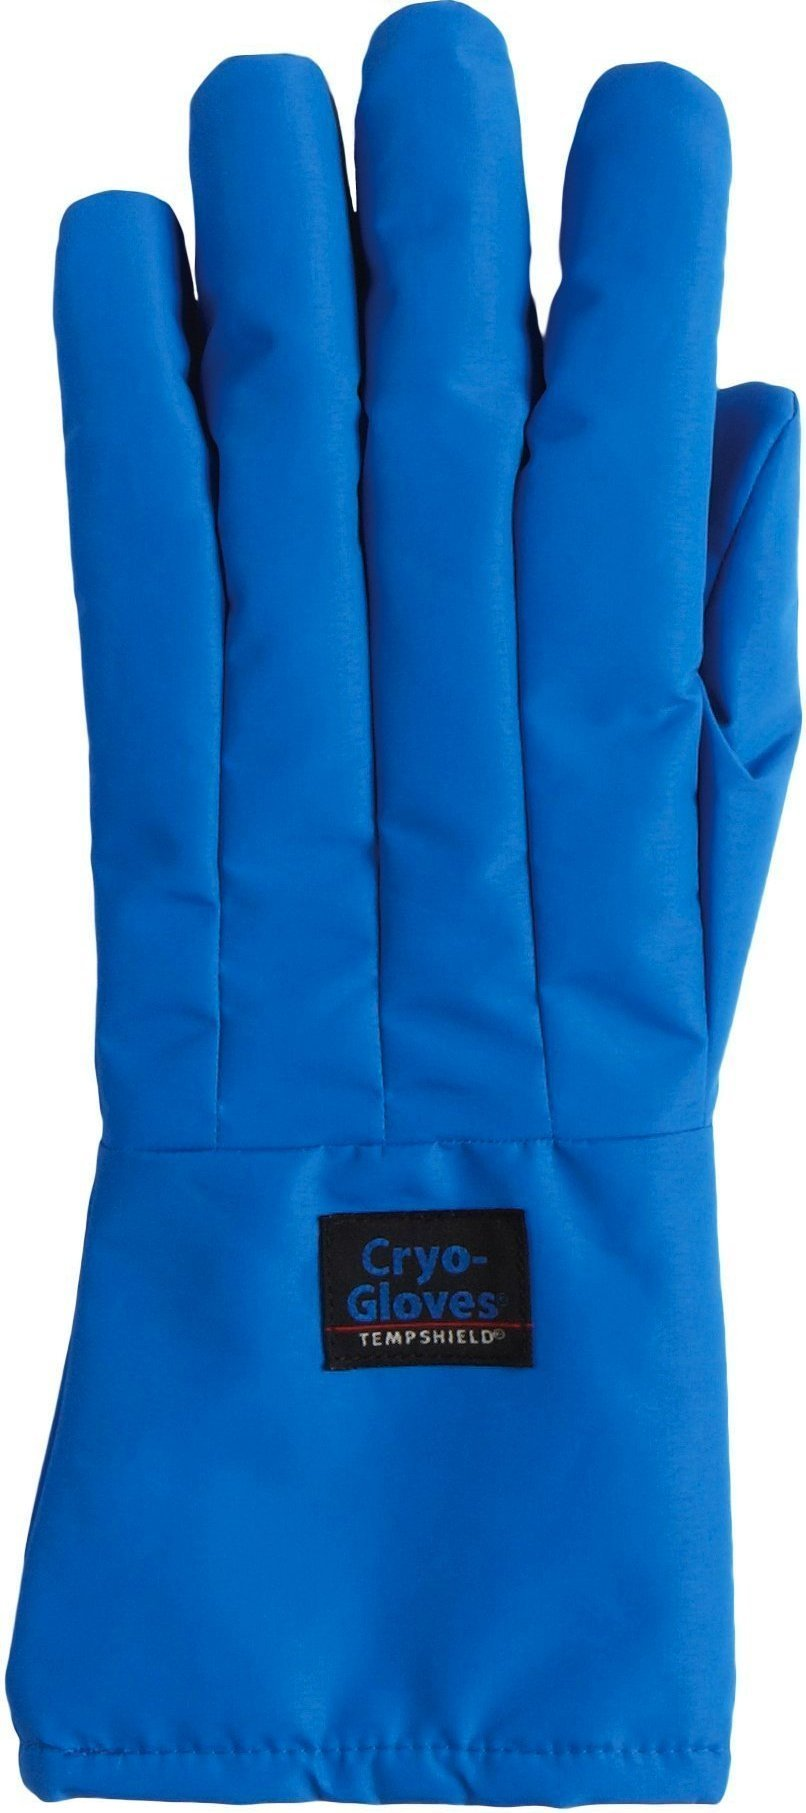 Tempshield MAXL Water-resistant gloves, 15''L, X-large, 1 pair